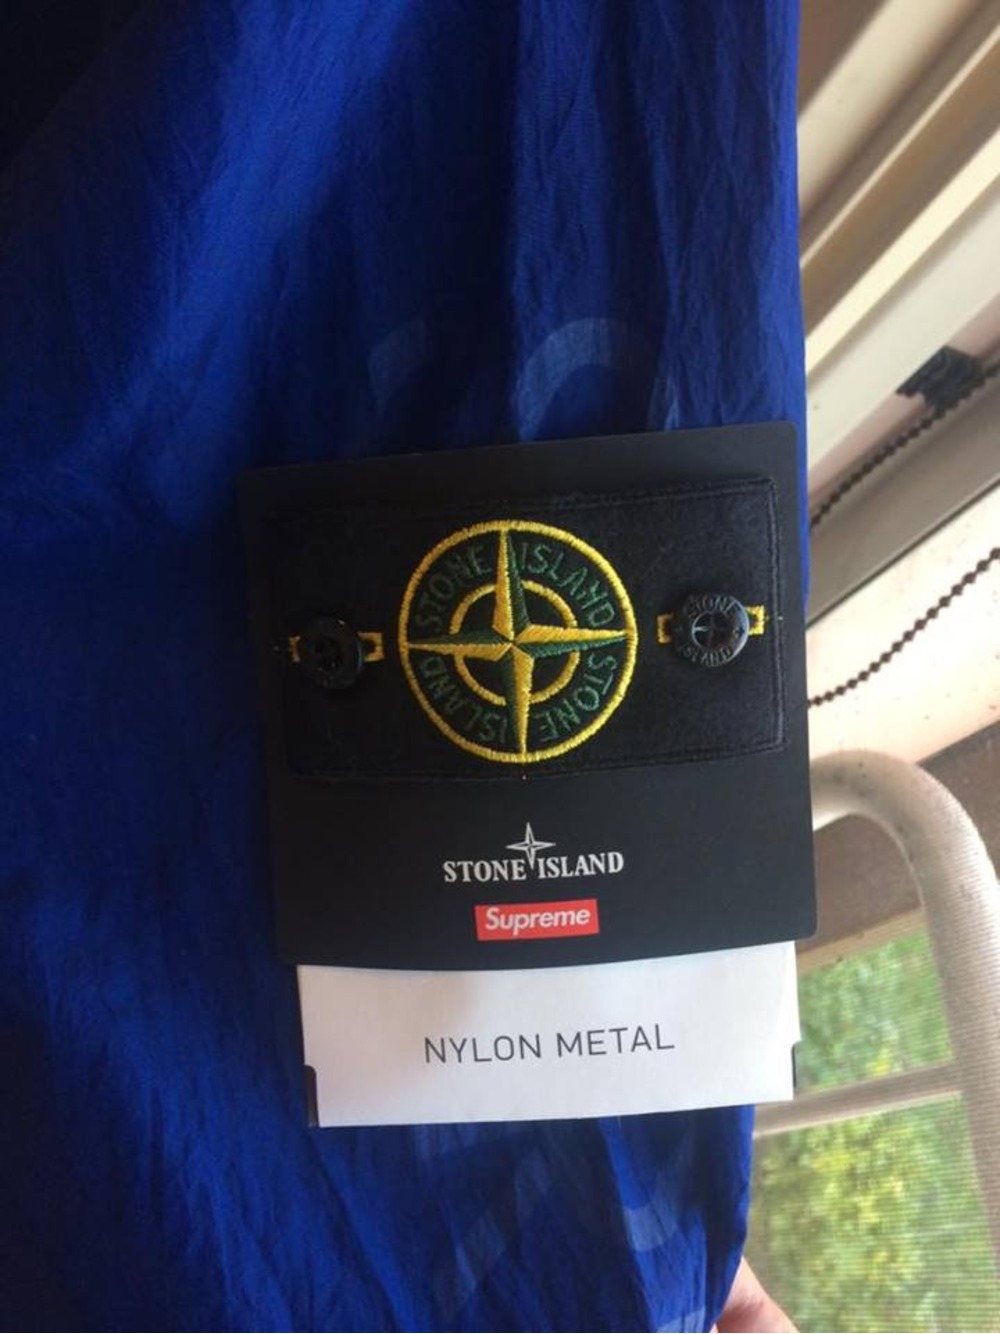 Supreme Stone Island Nylon Metal Jacket